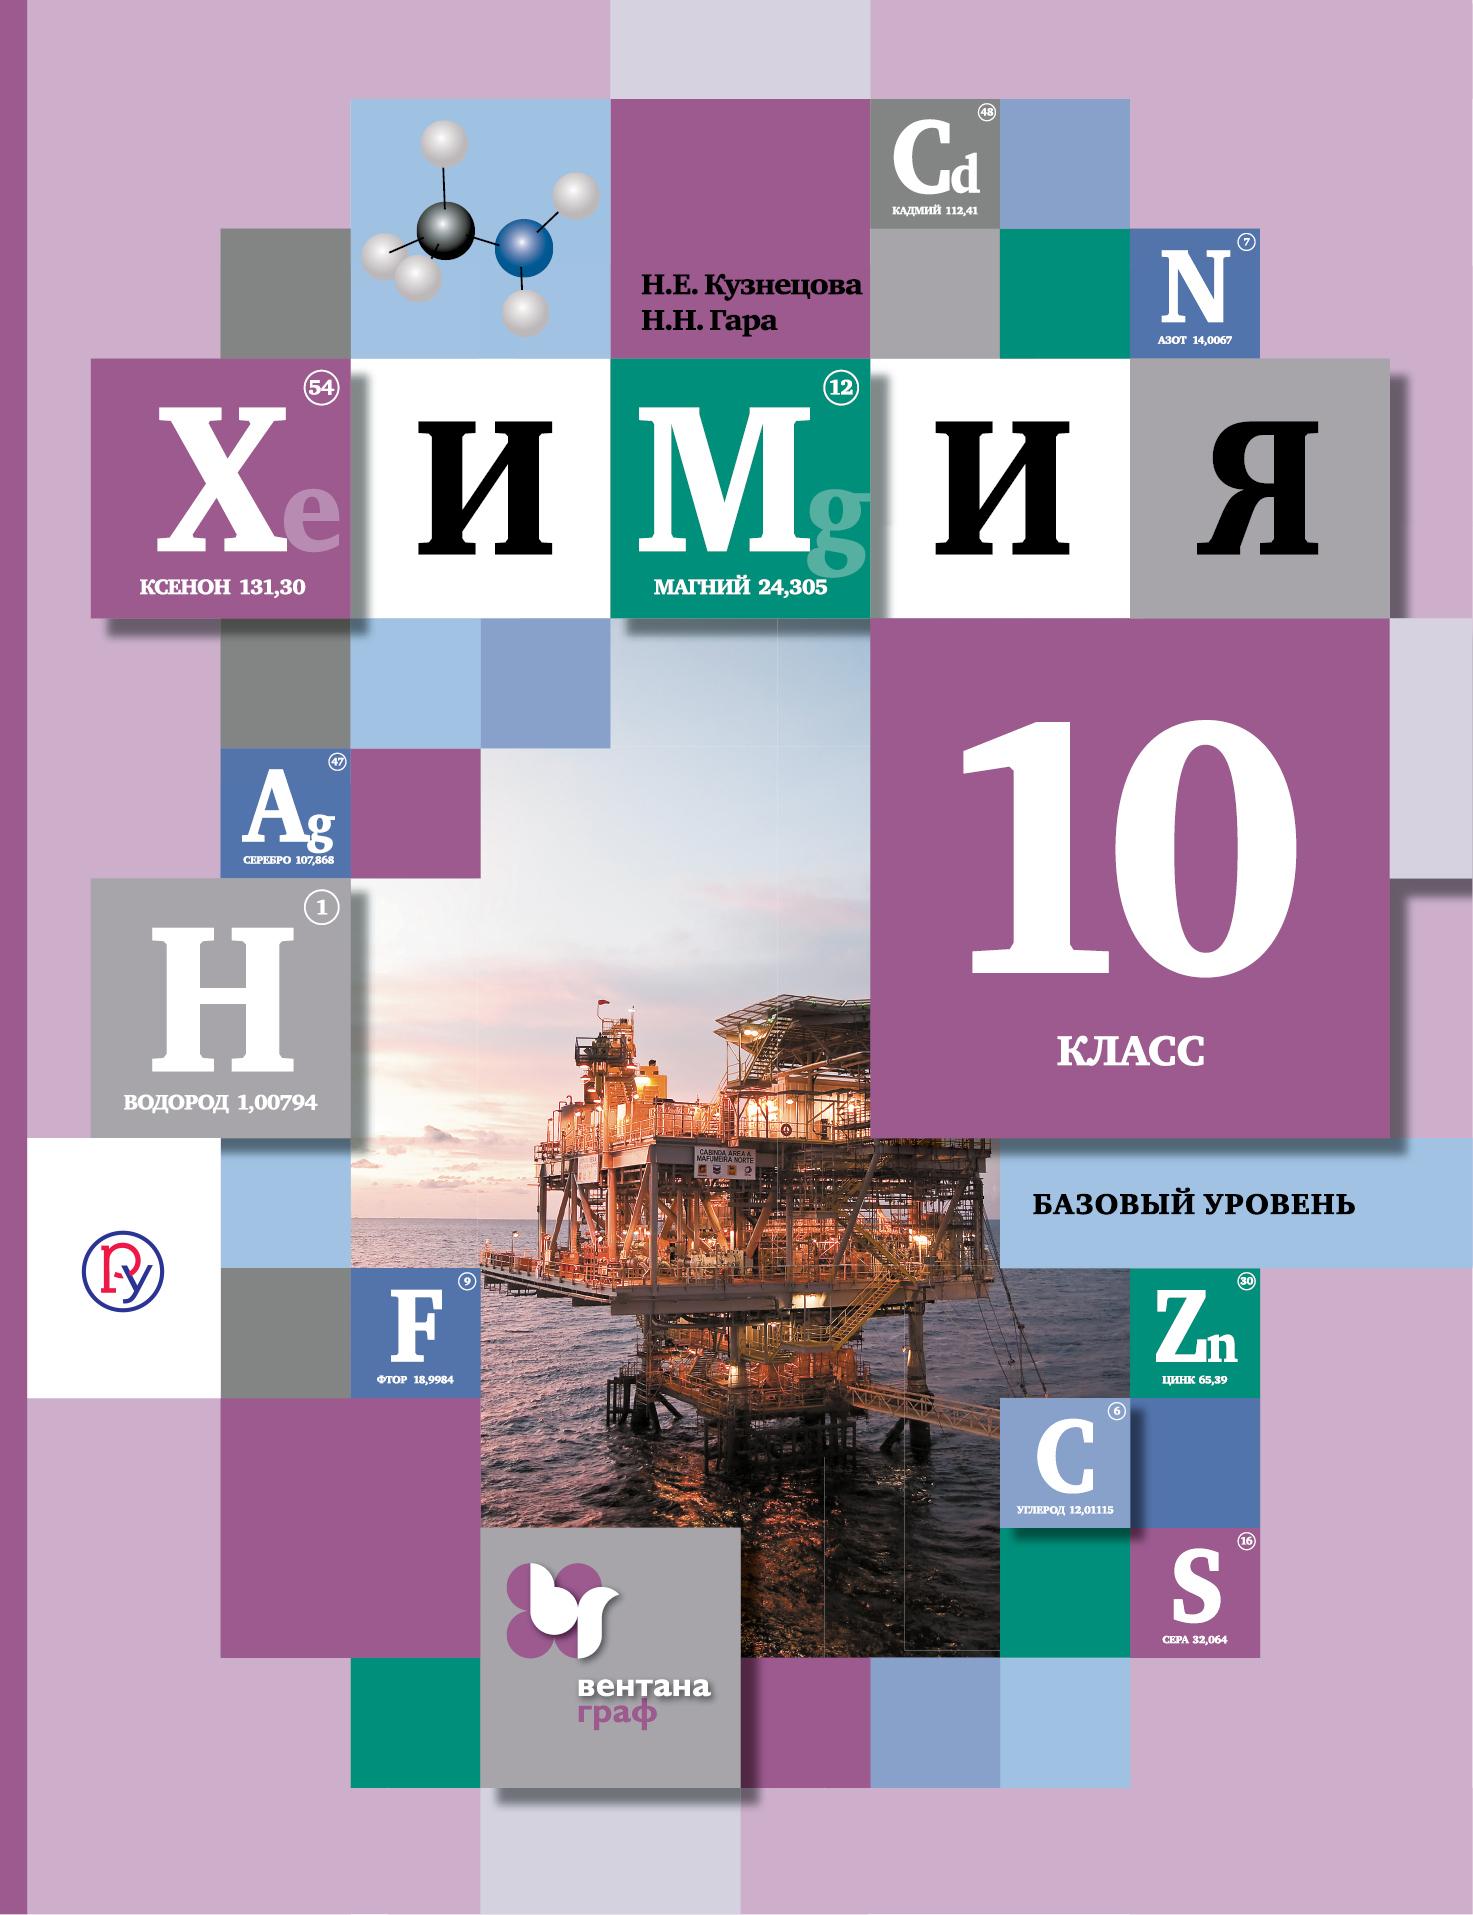 Химия. Базовый уровень. 10кл. Учебник. ( Кузнецова Н.Е., Гара Н.Н.  )